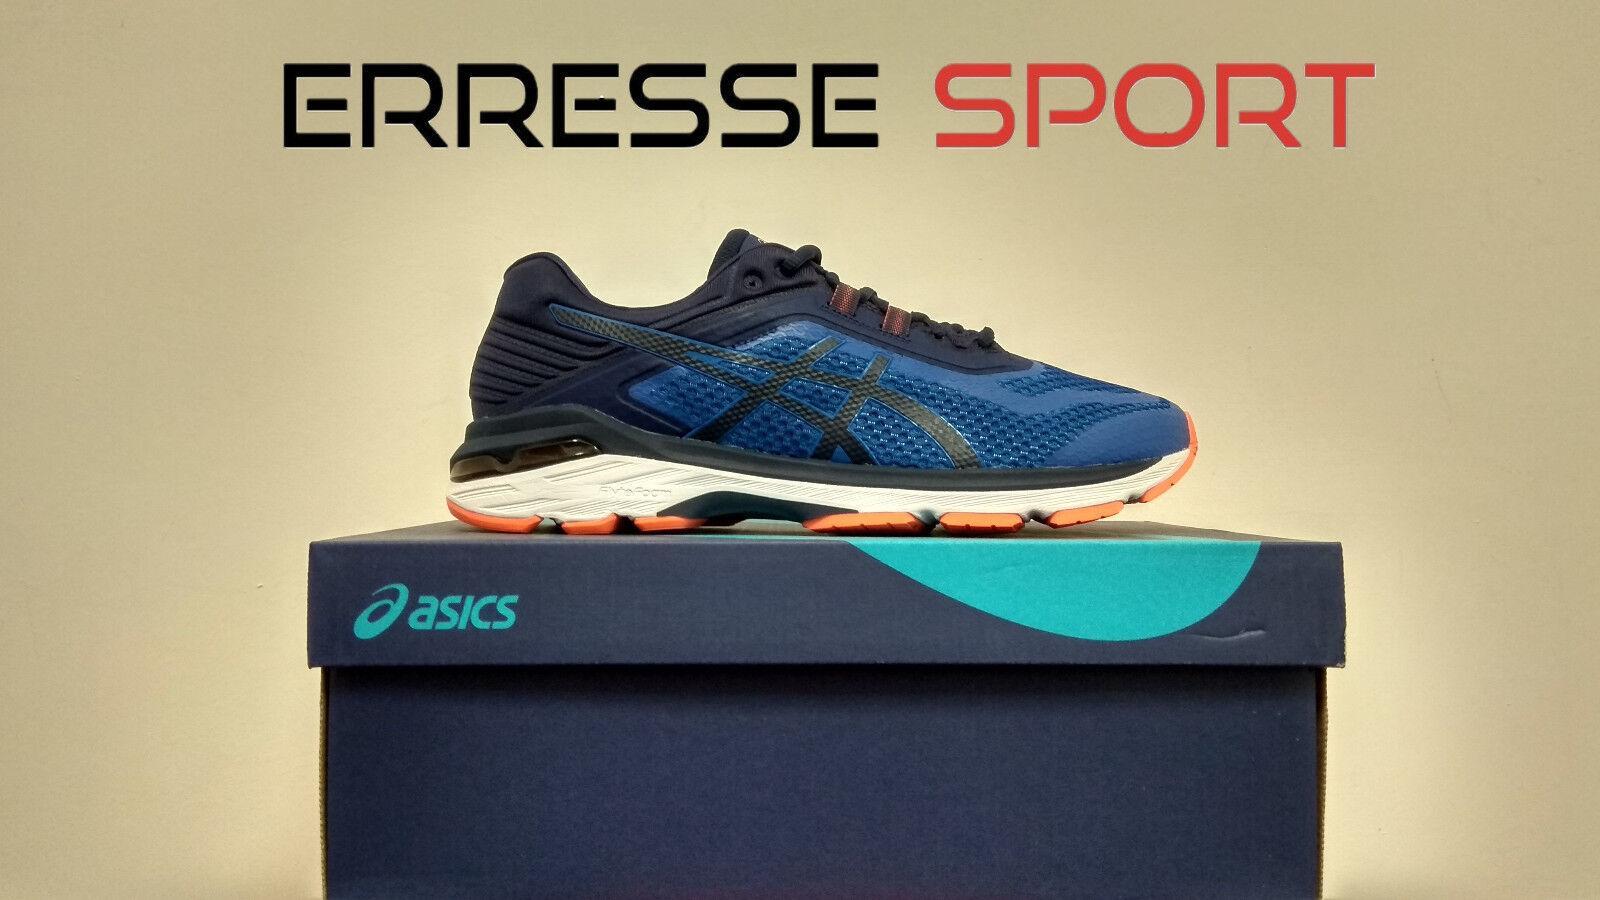 Asics GT 2018 6 Zapatos antipronazione running corsa hombre A4 antipronazione Zapatos f9bbe8